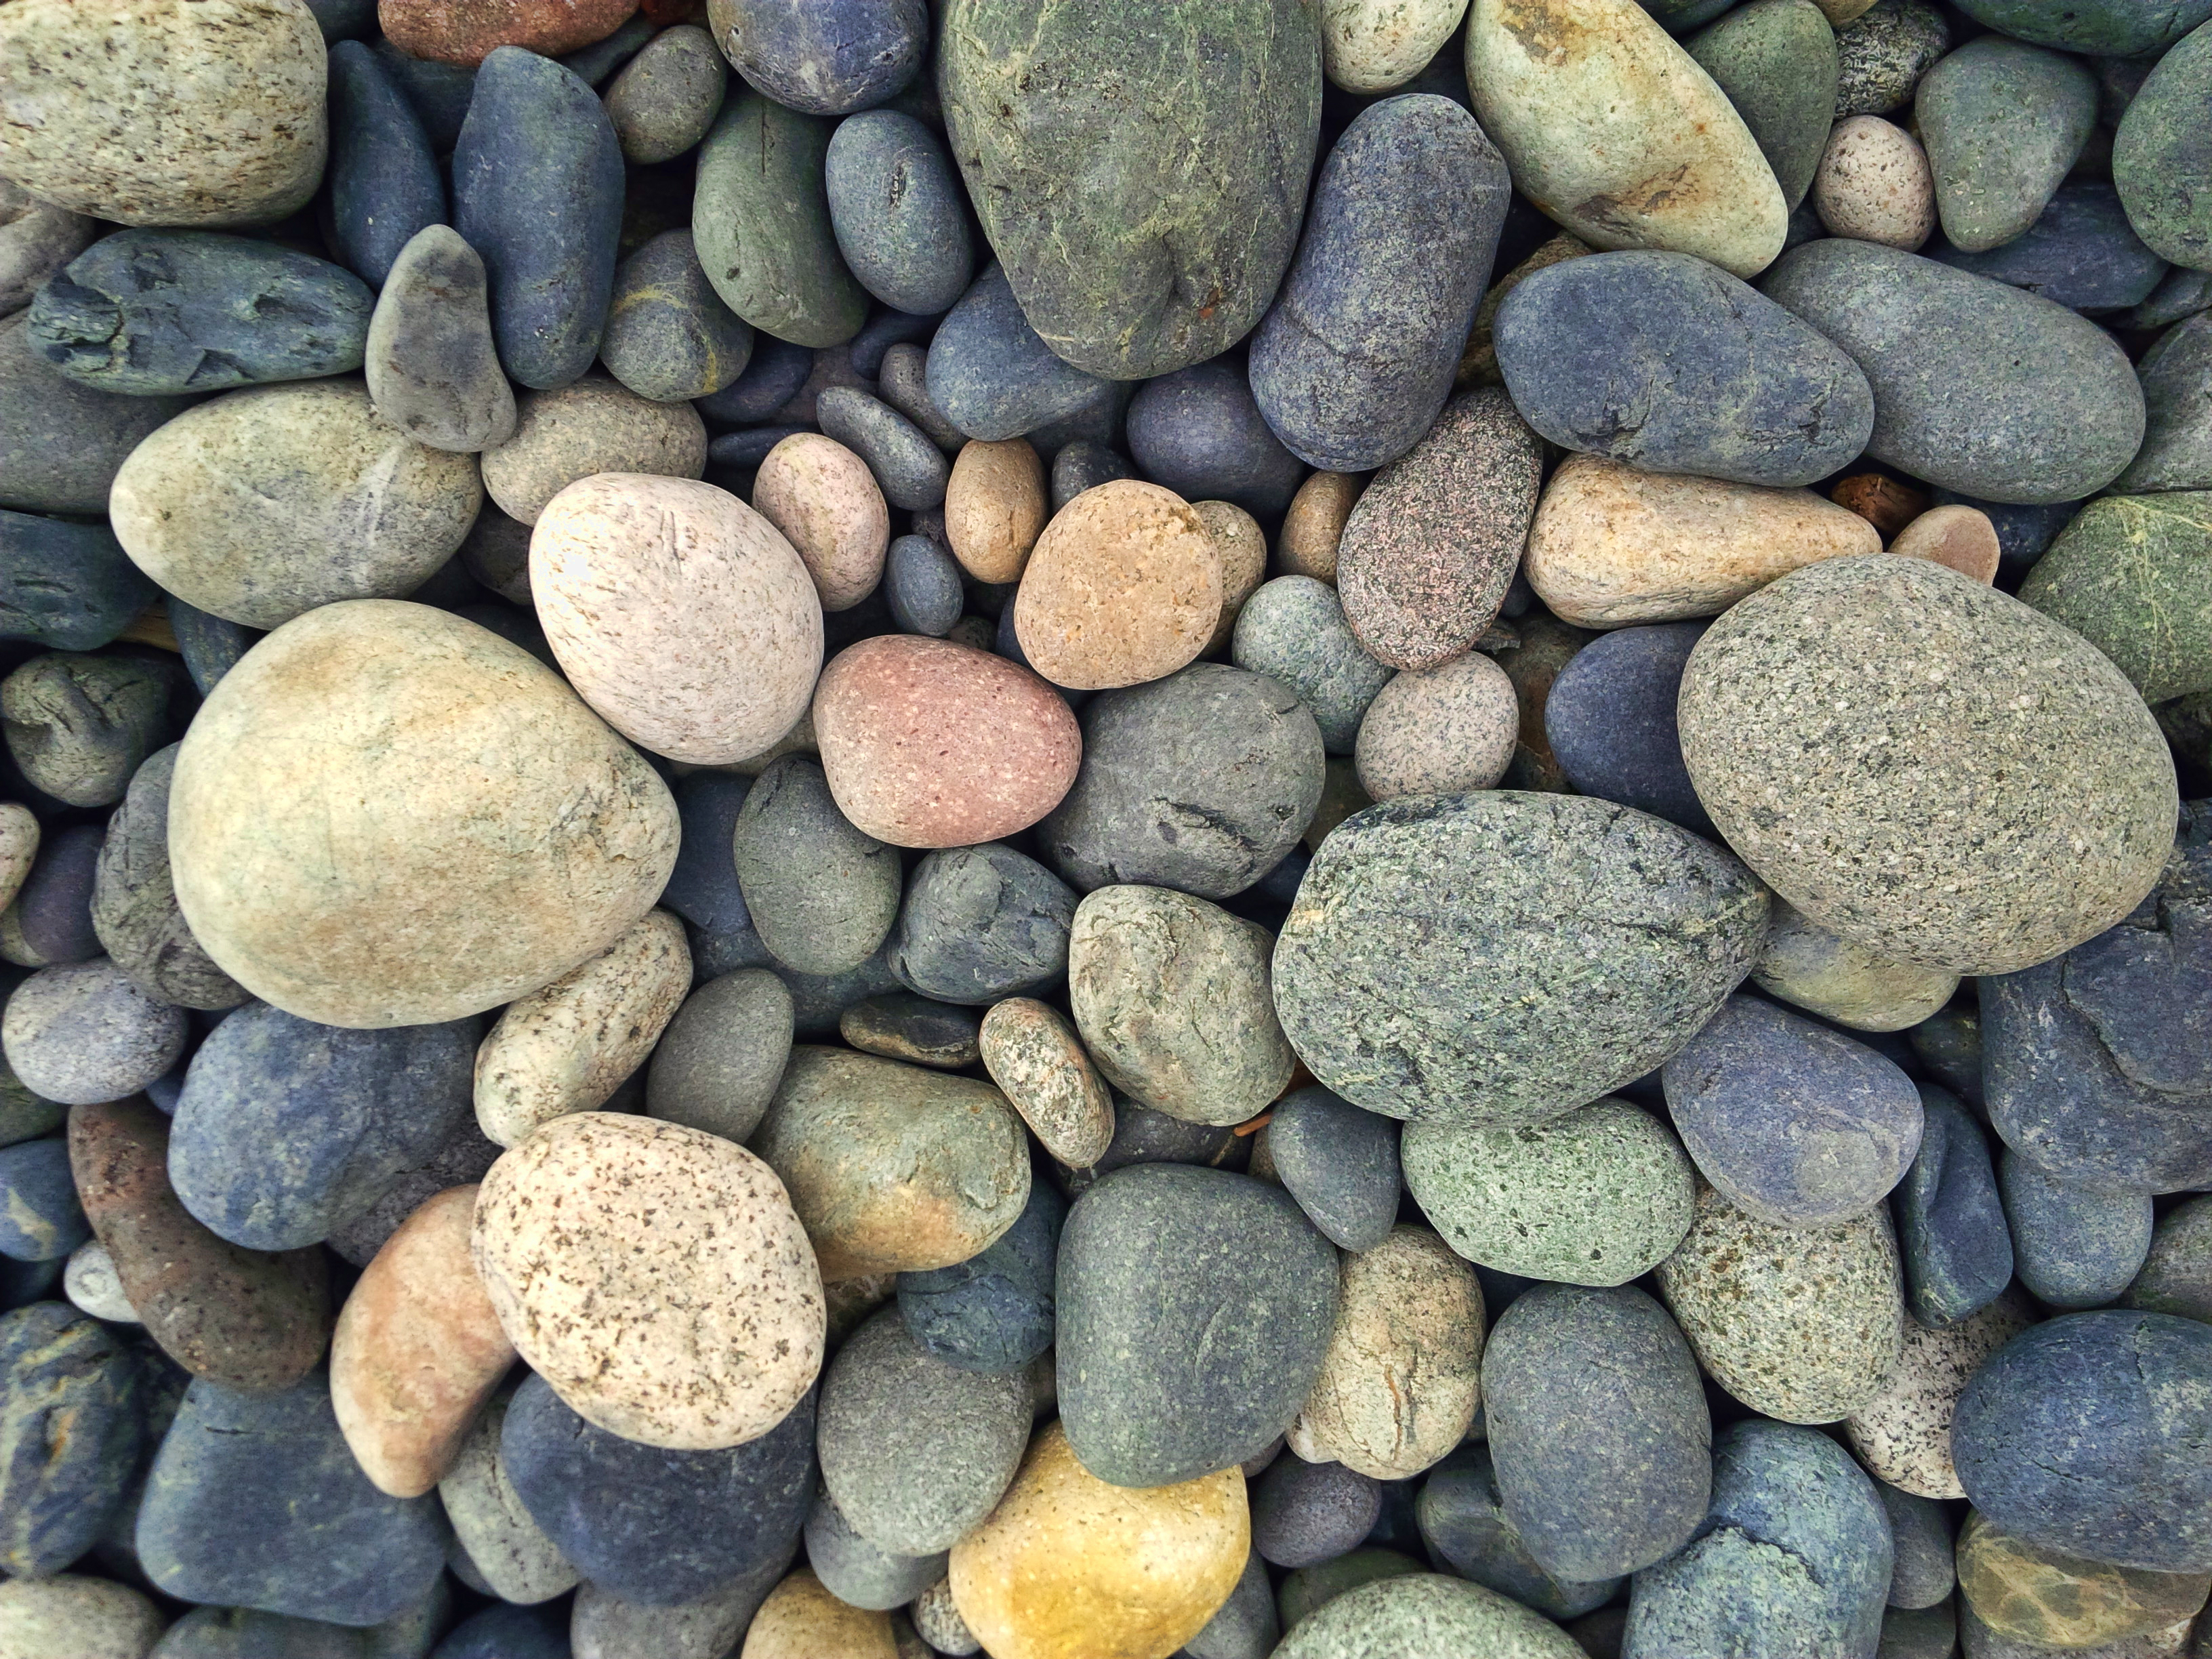 Stone Hd Wallpaper Background Image 3264x2448 Id441030